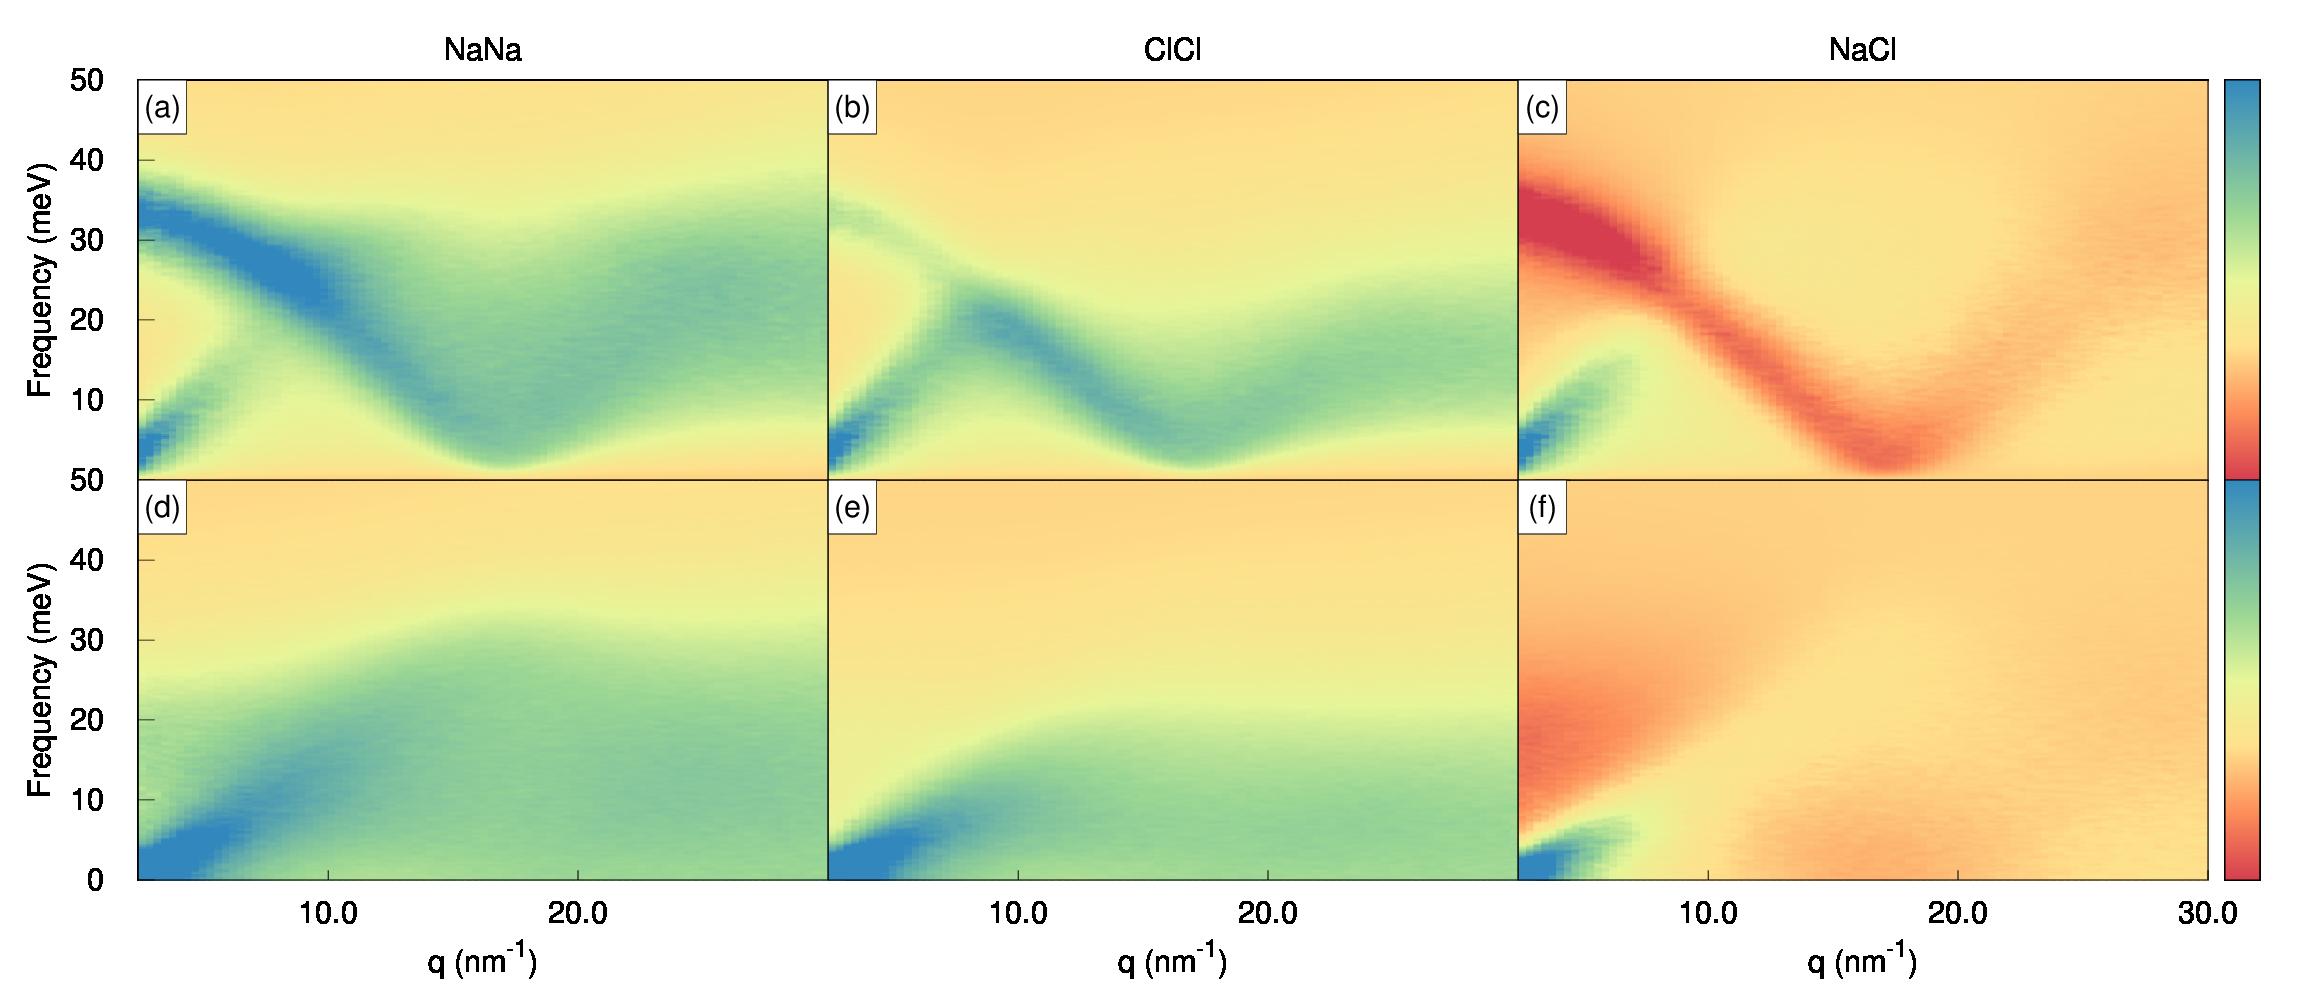 doc/examples/figs/NaCl_liquid/NaCl_partial_heatmaps.png